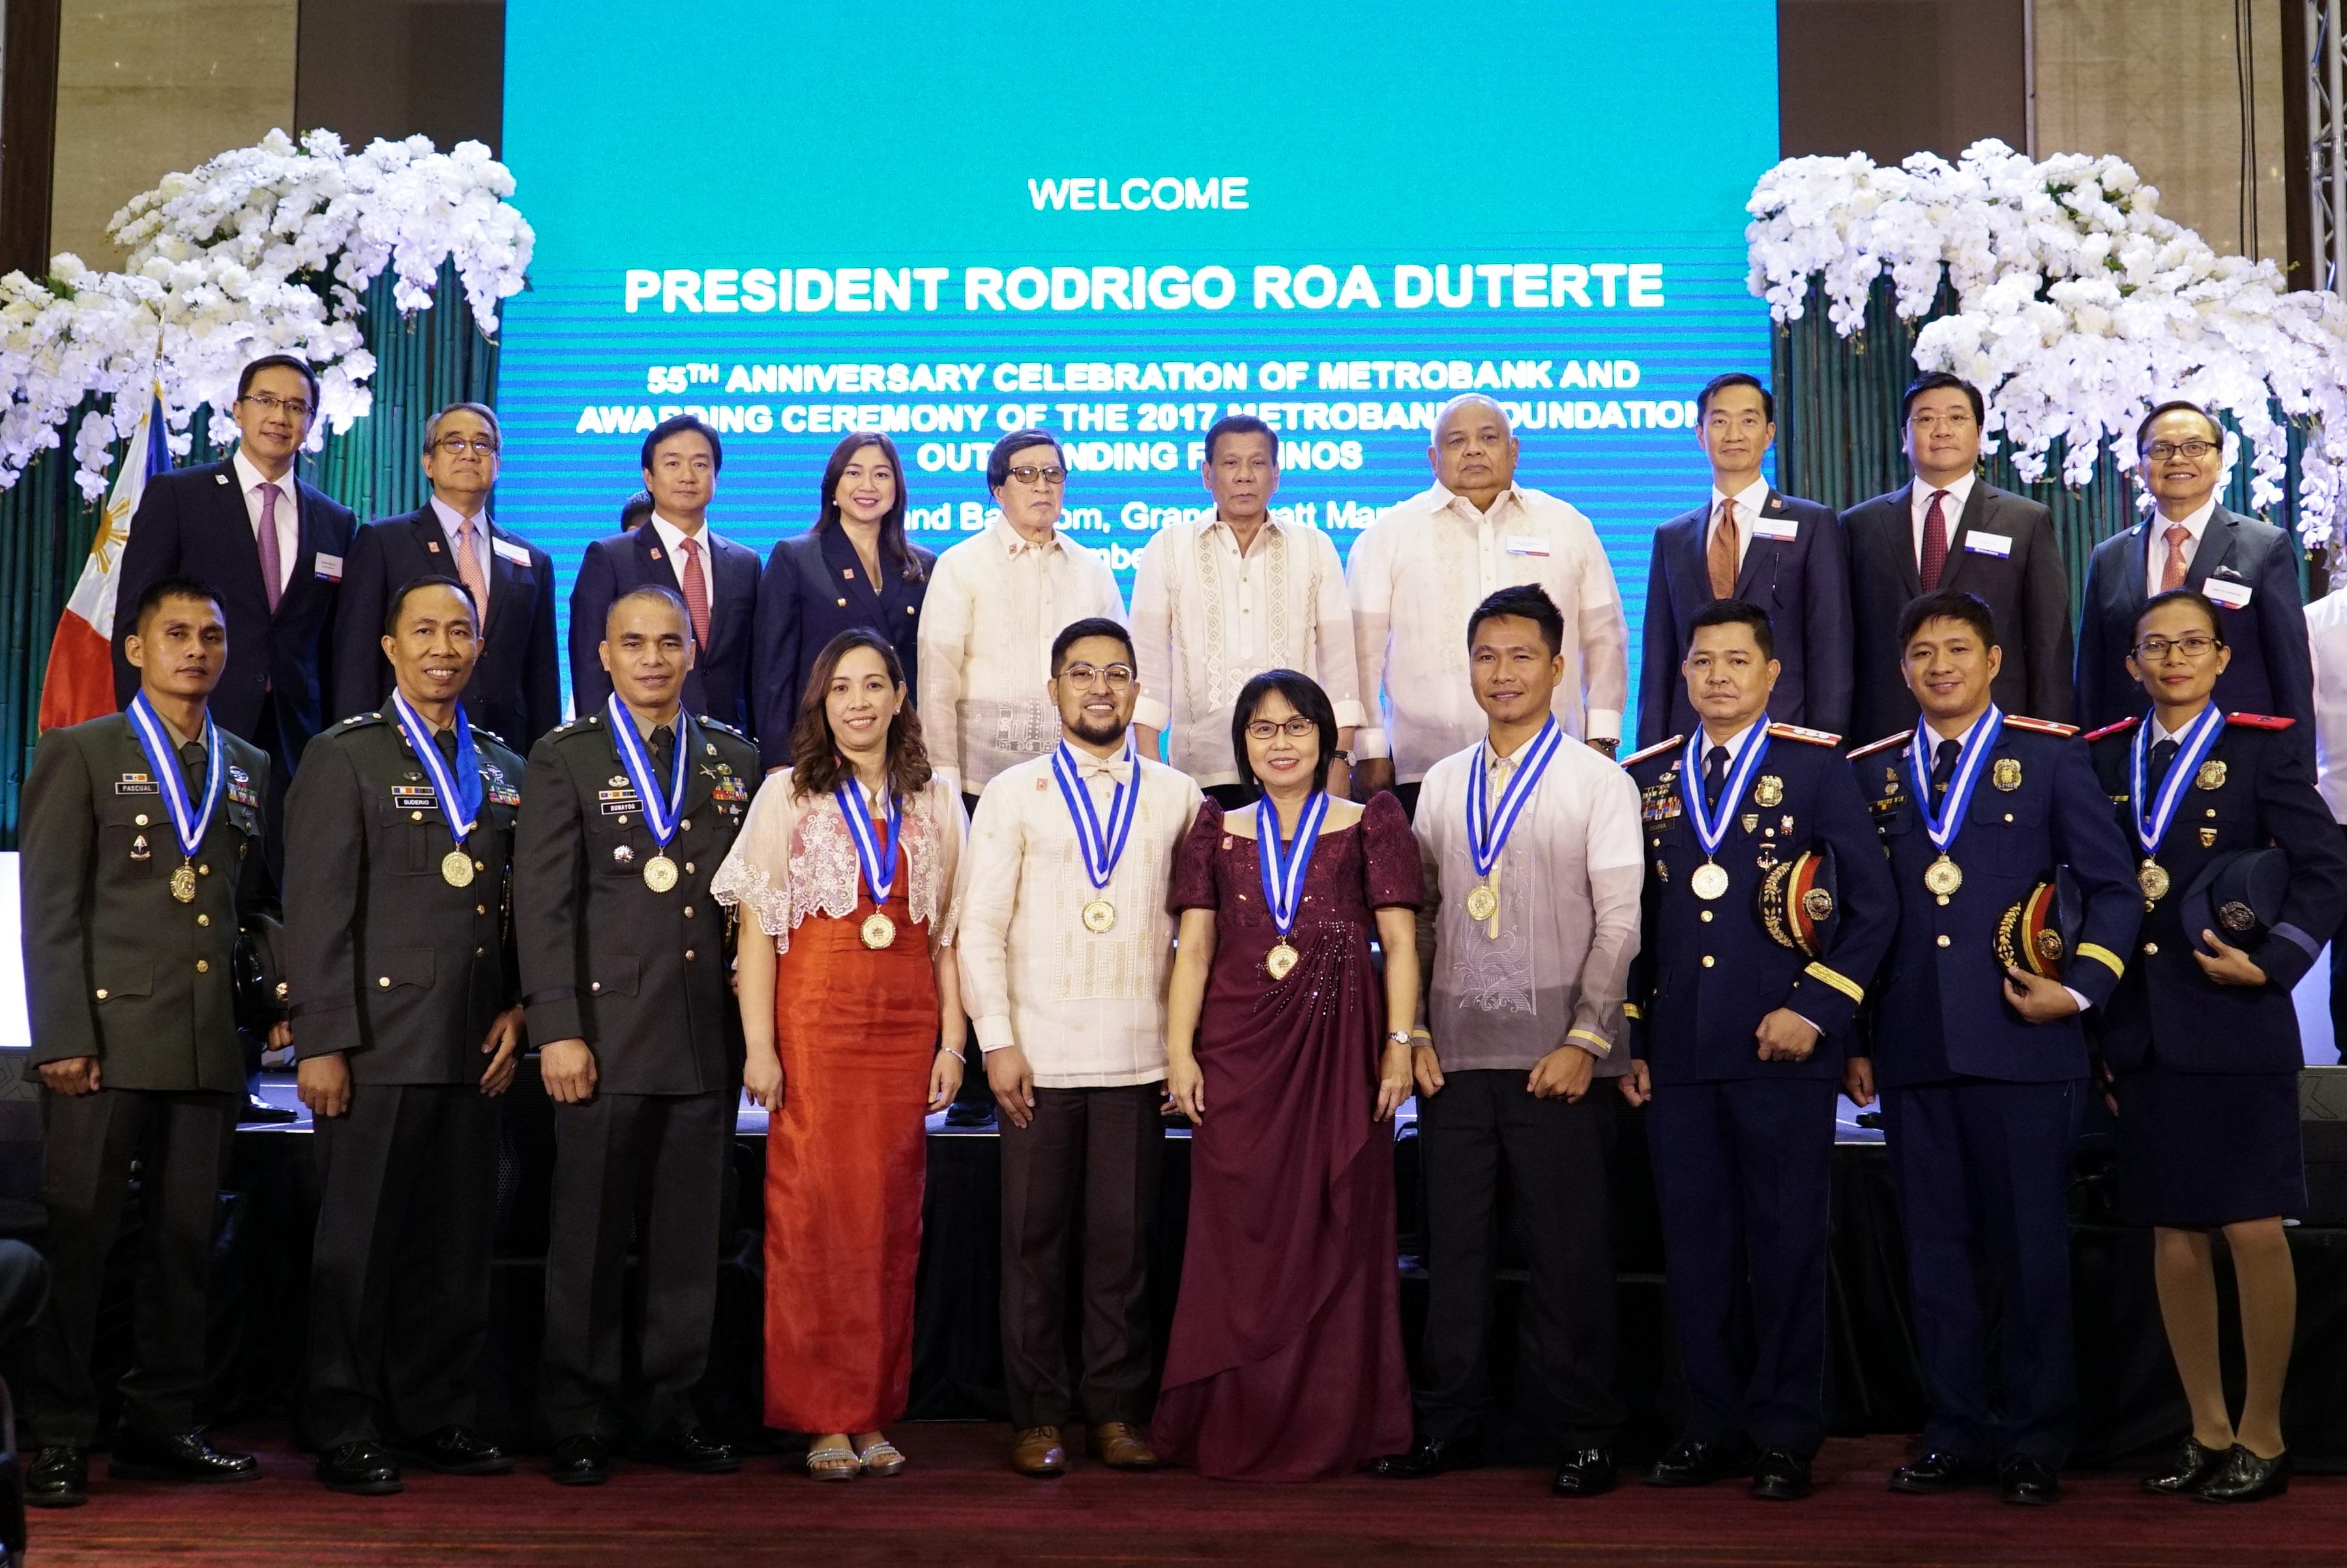 AWARD. Senior Superintendent Joel Doria (3rd from left, first row) poses with fellow awardees, Metrobank Foundation officials, and President Rodrigo Duterte. Malacau00f1ang photo